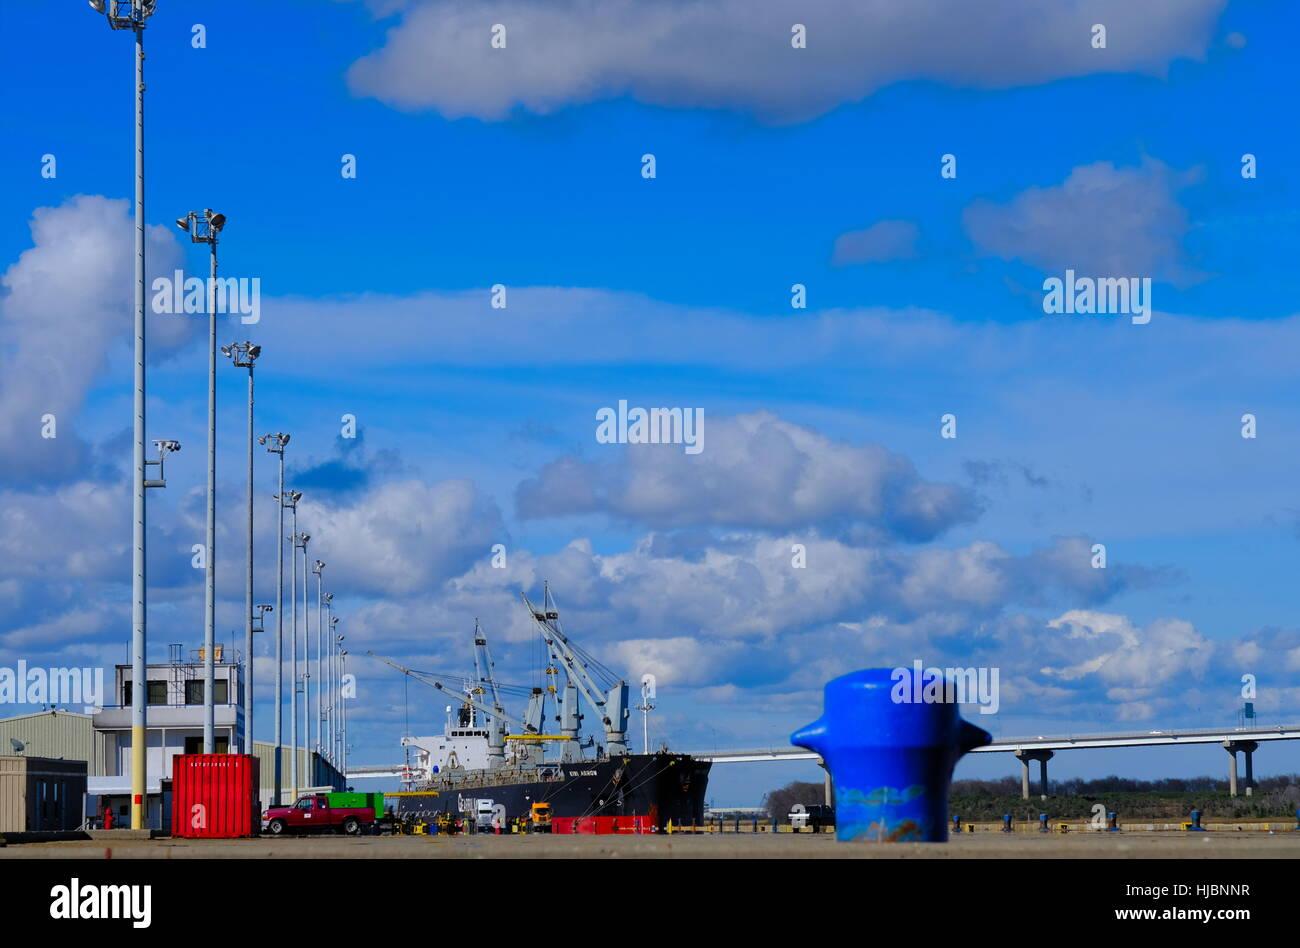 Dockside at Port - Stock Image